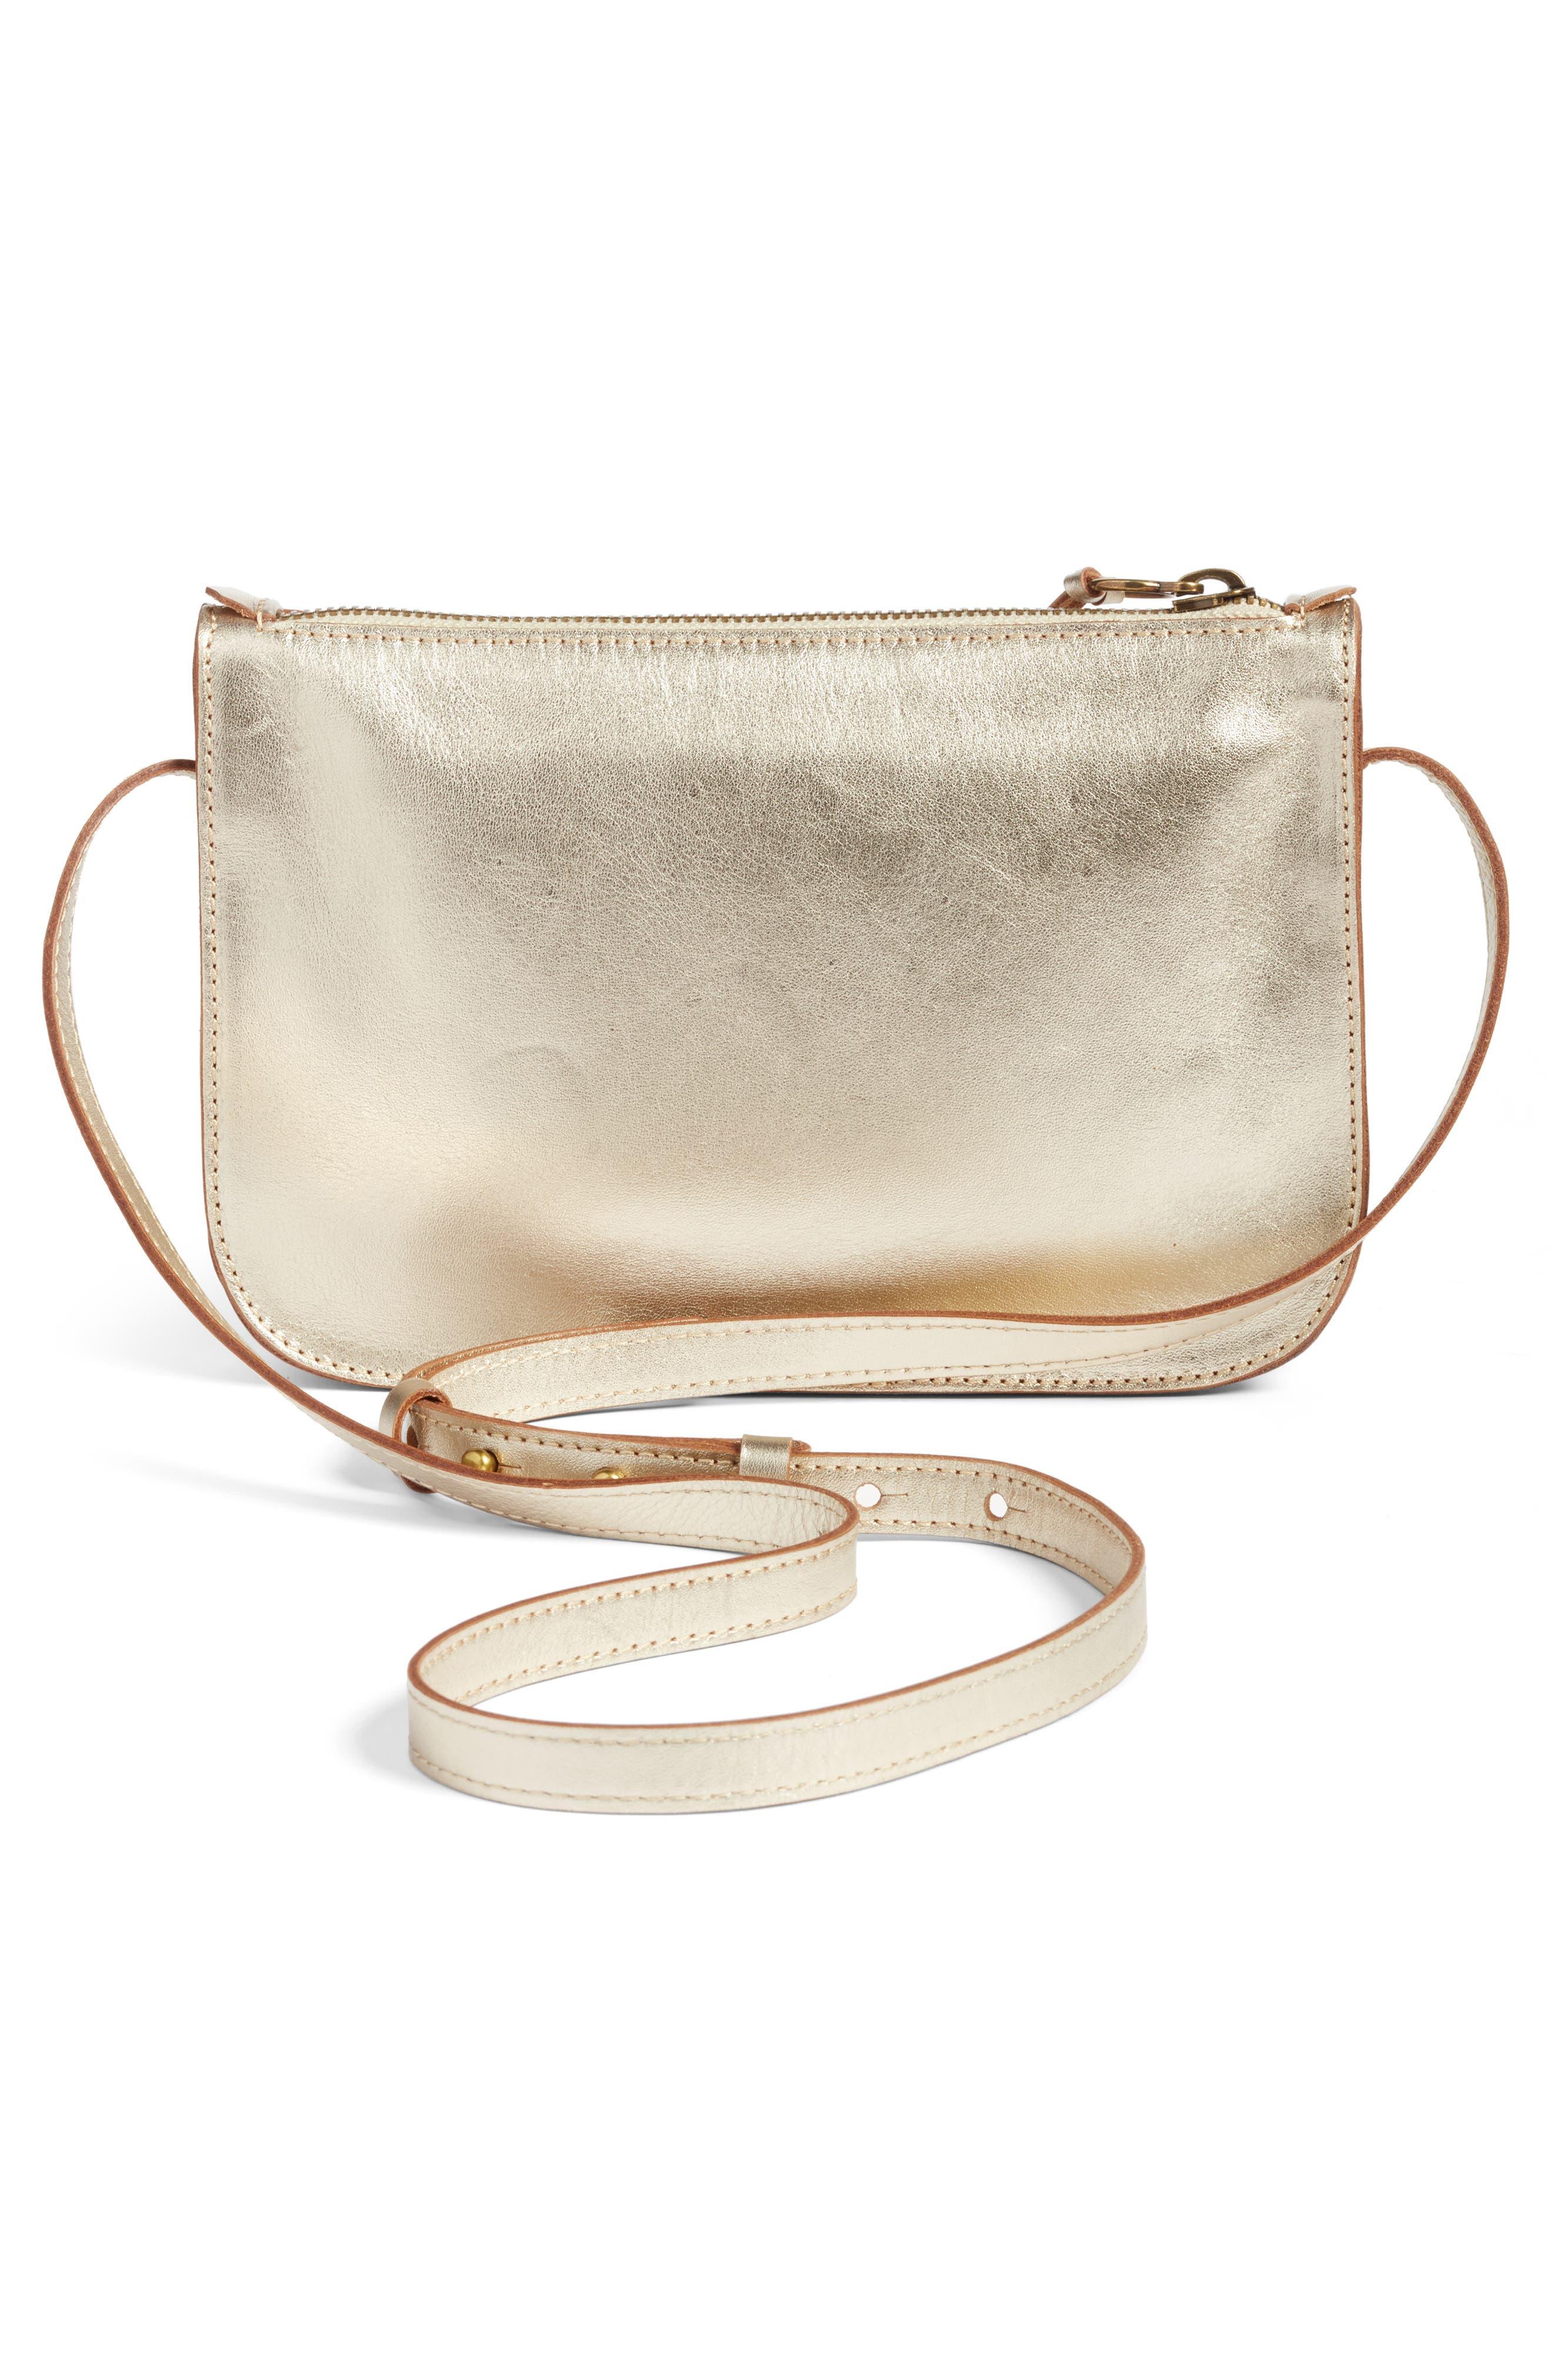 Leather Crossbody Bag,                             Alternate thumbnail 3, color,                             Gold Metallic